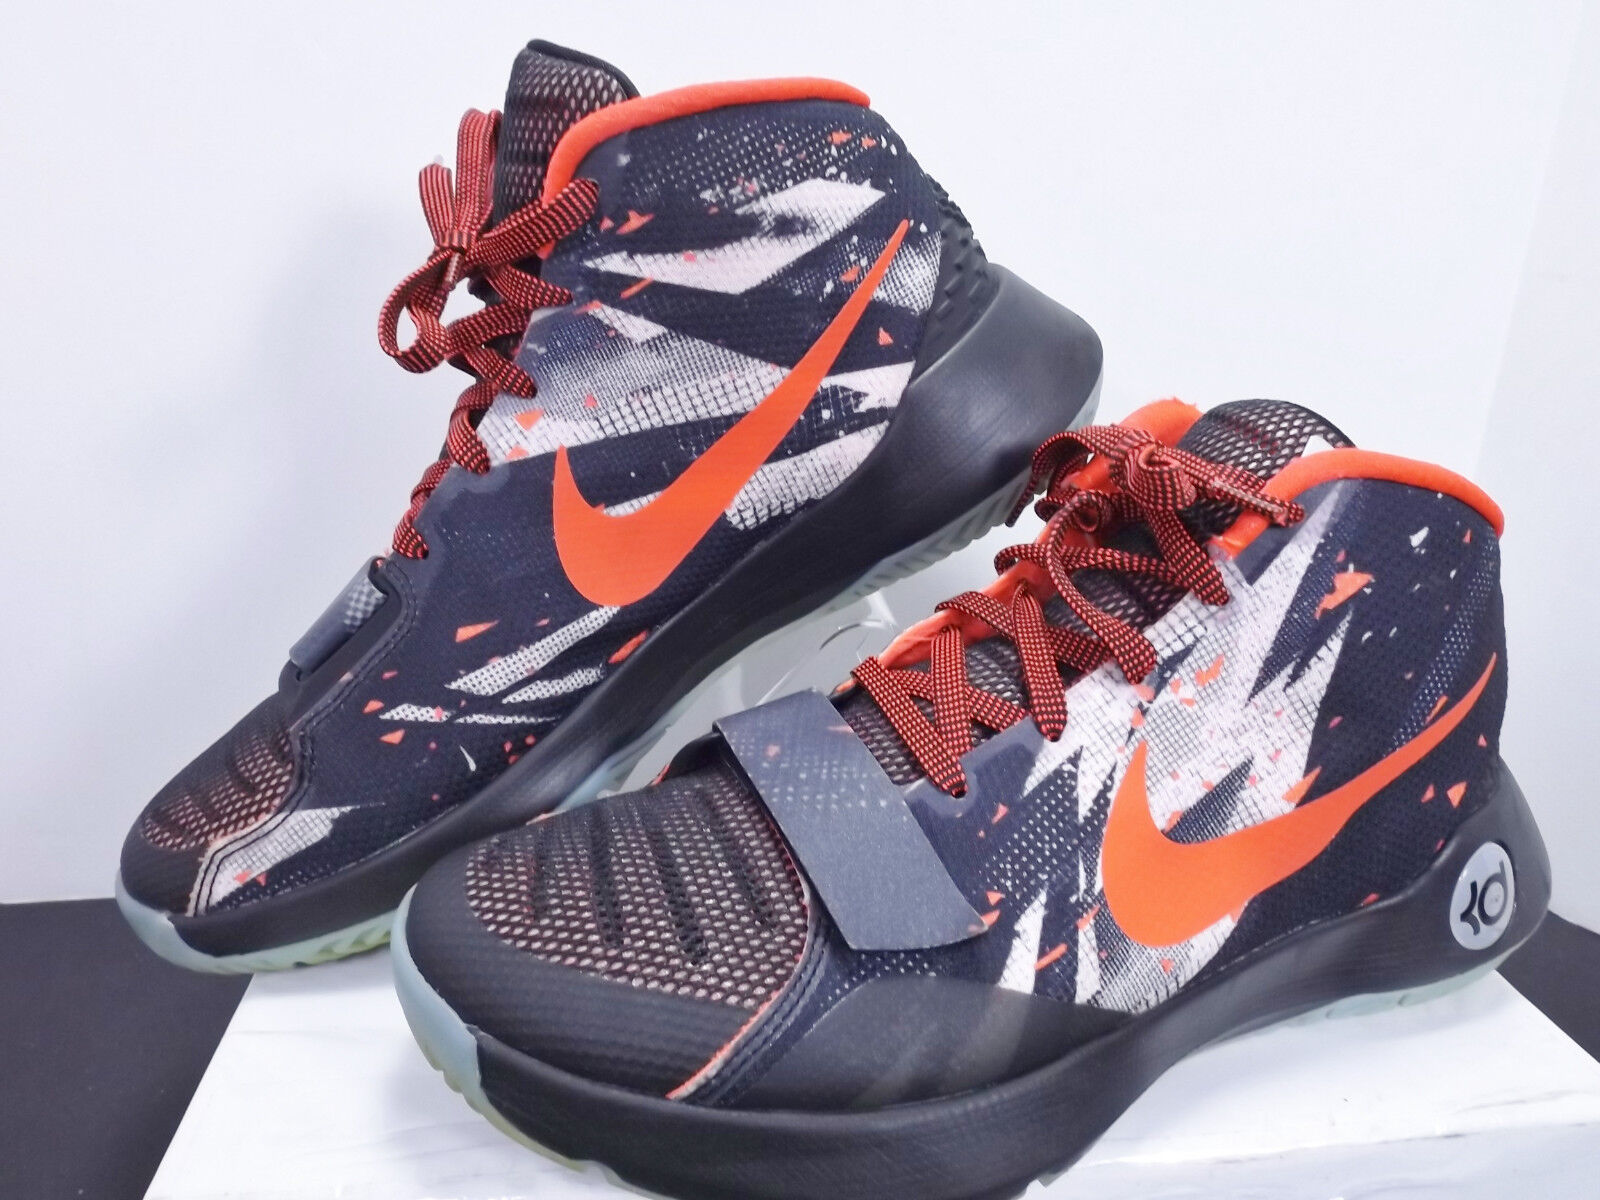 Nike KD Trey 5 III 's 749379 001 Black/Metallic-Silver/Crimson Men's Comfortable